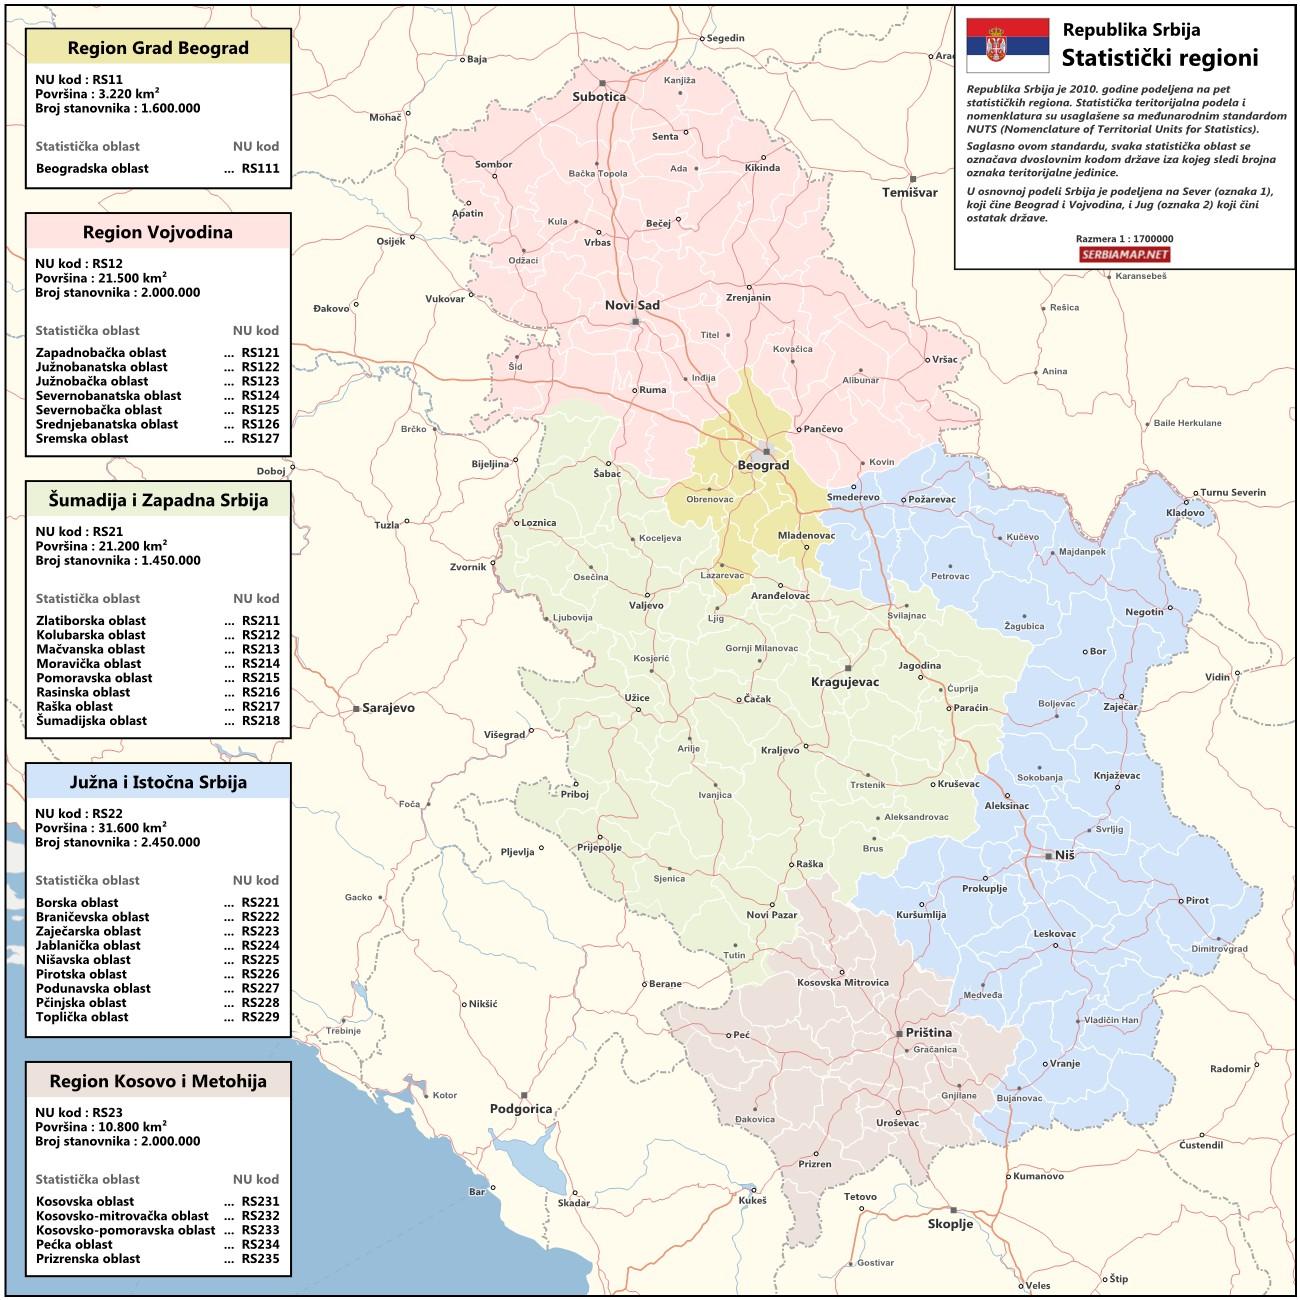 detaljna mapa srbije Serbiamap.Net: Mapa statističkih regiona Srbije detaljna mapa srbije